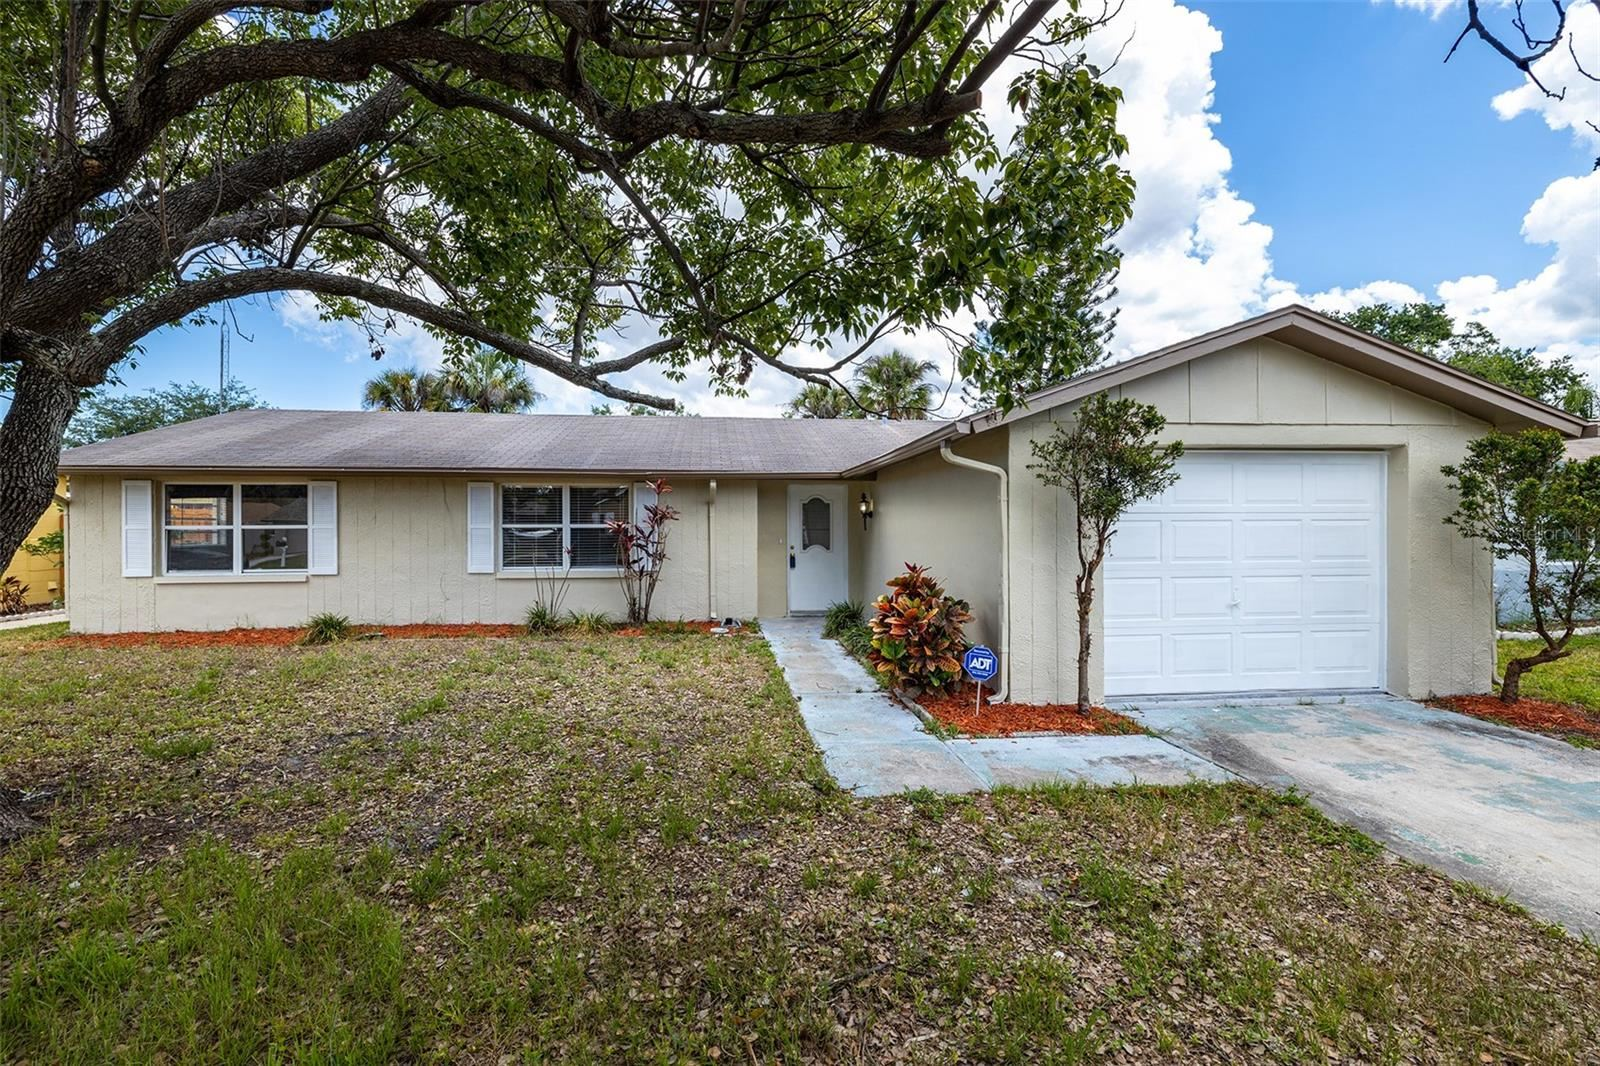 7419 ABINGTON AVENUE, New Port Richey, FL 34655 - MLS#: U8126811